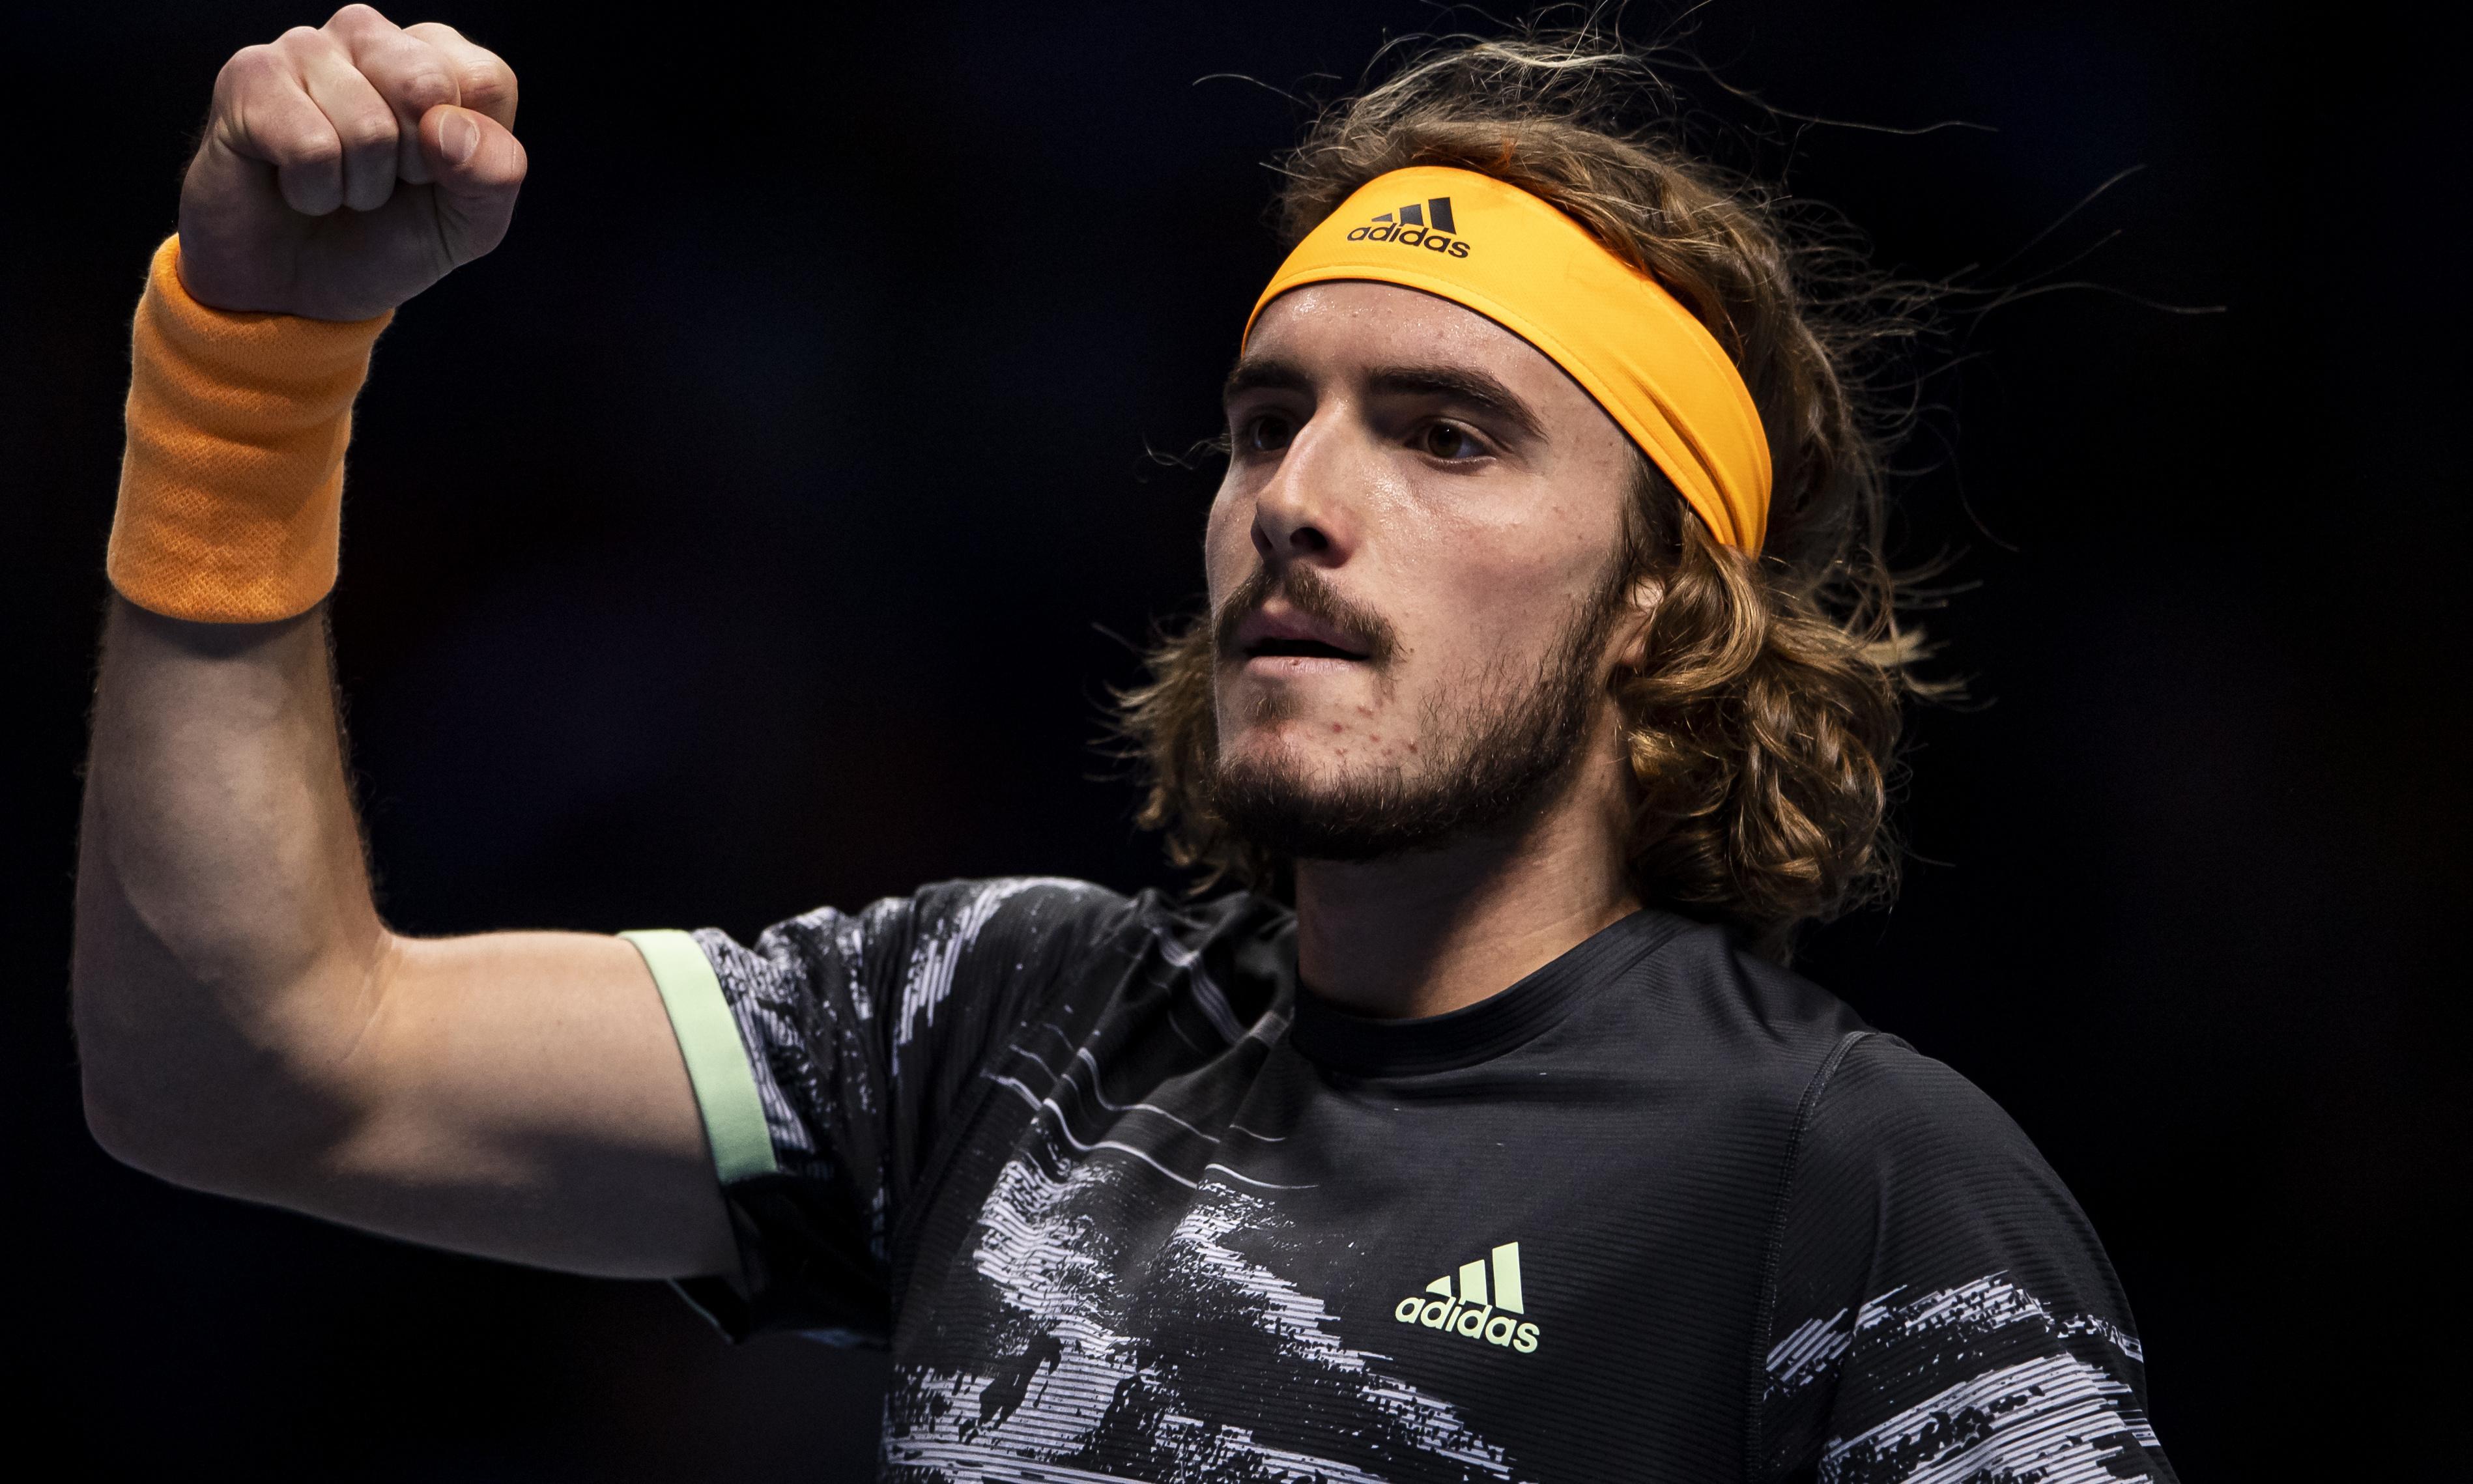 Stefanos Tsitsipas overcomes Roger Federer to reach final of ATP Finals